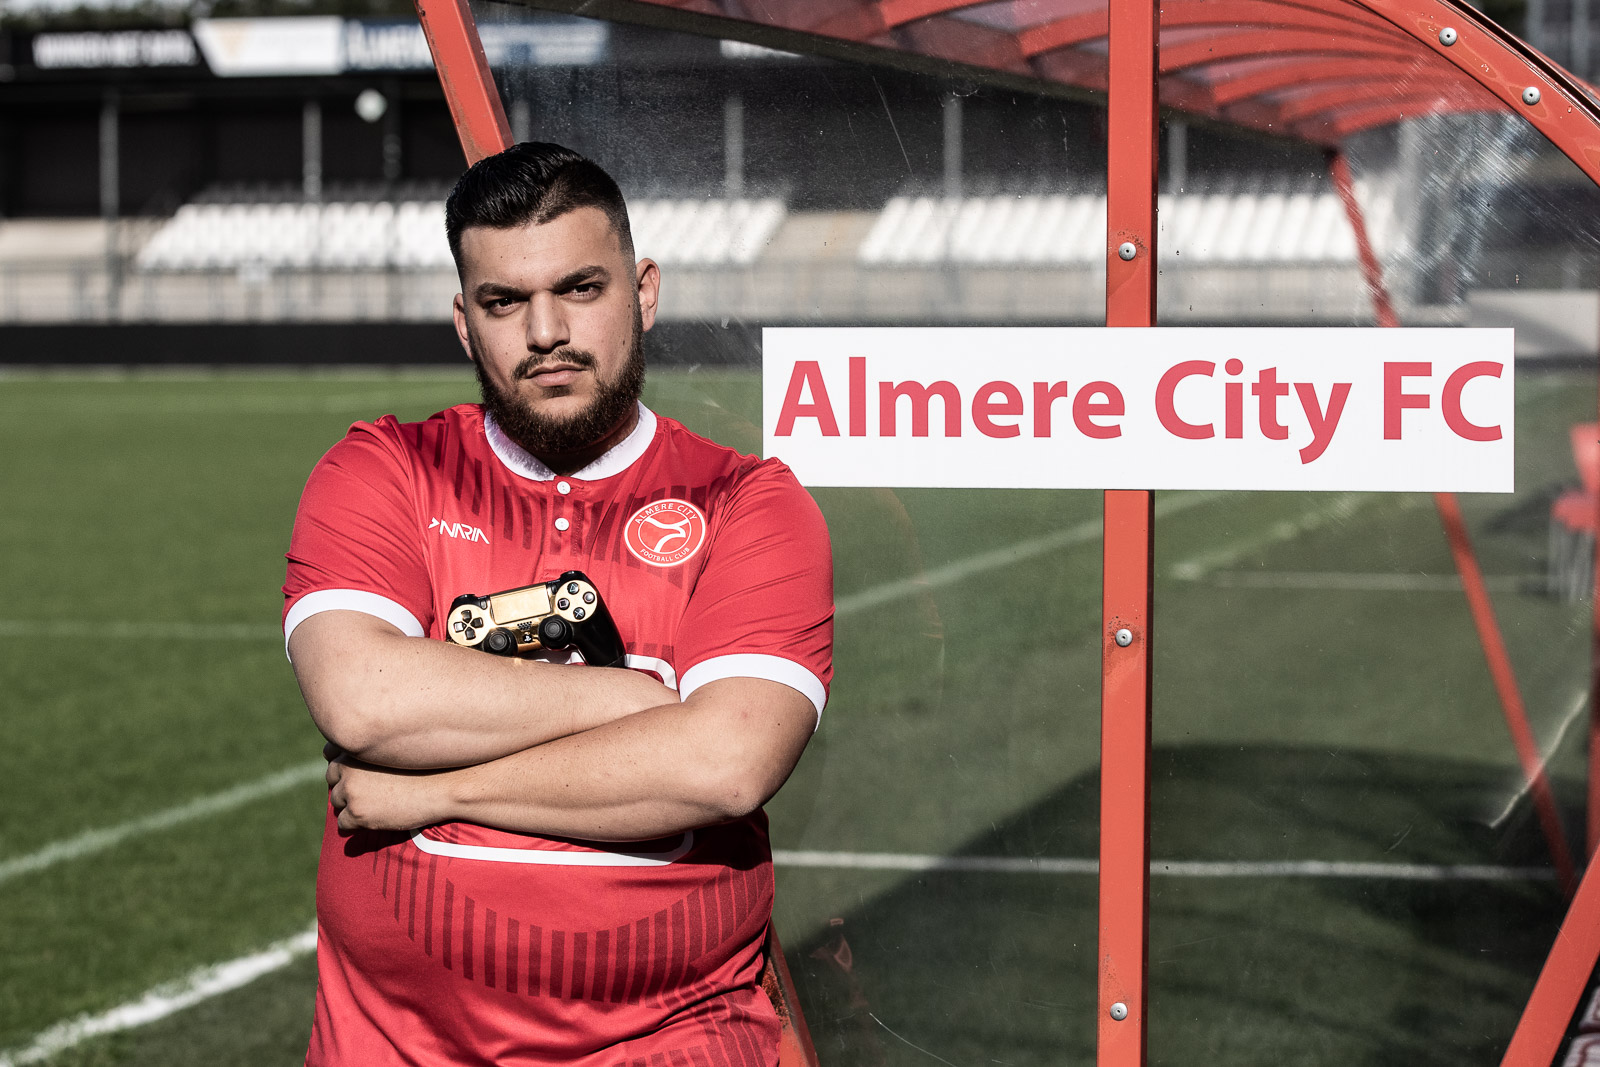 Yonni Kan e-Sporter van Almere City FC